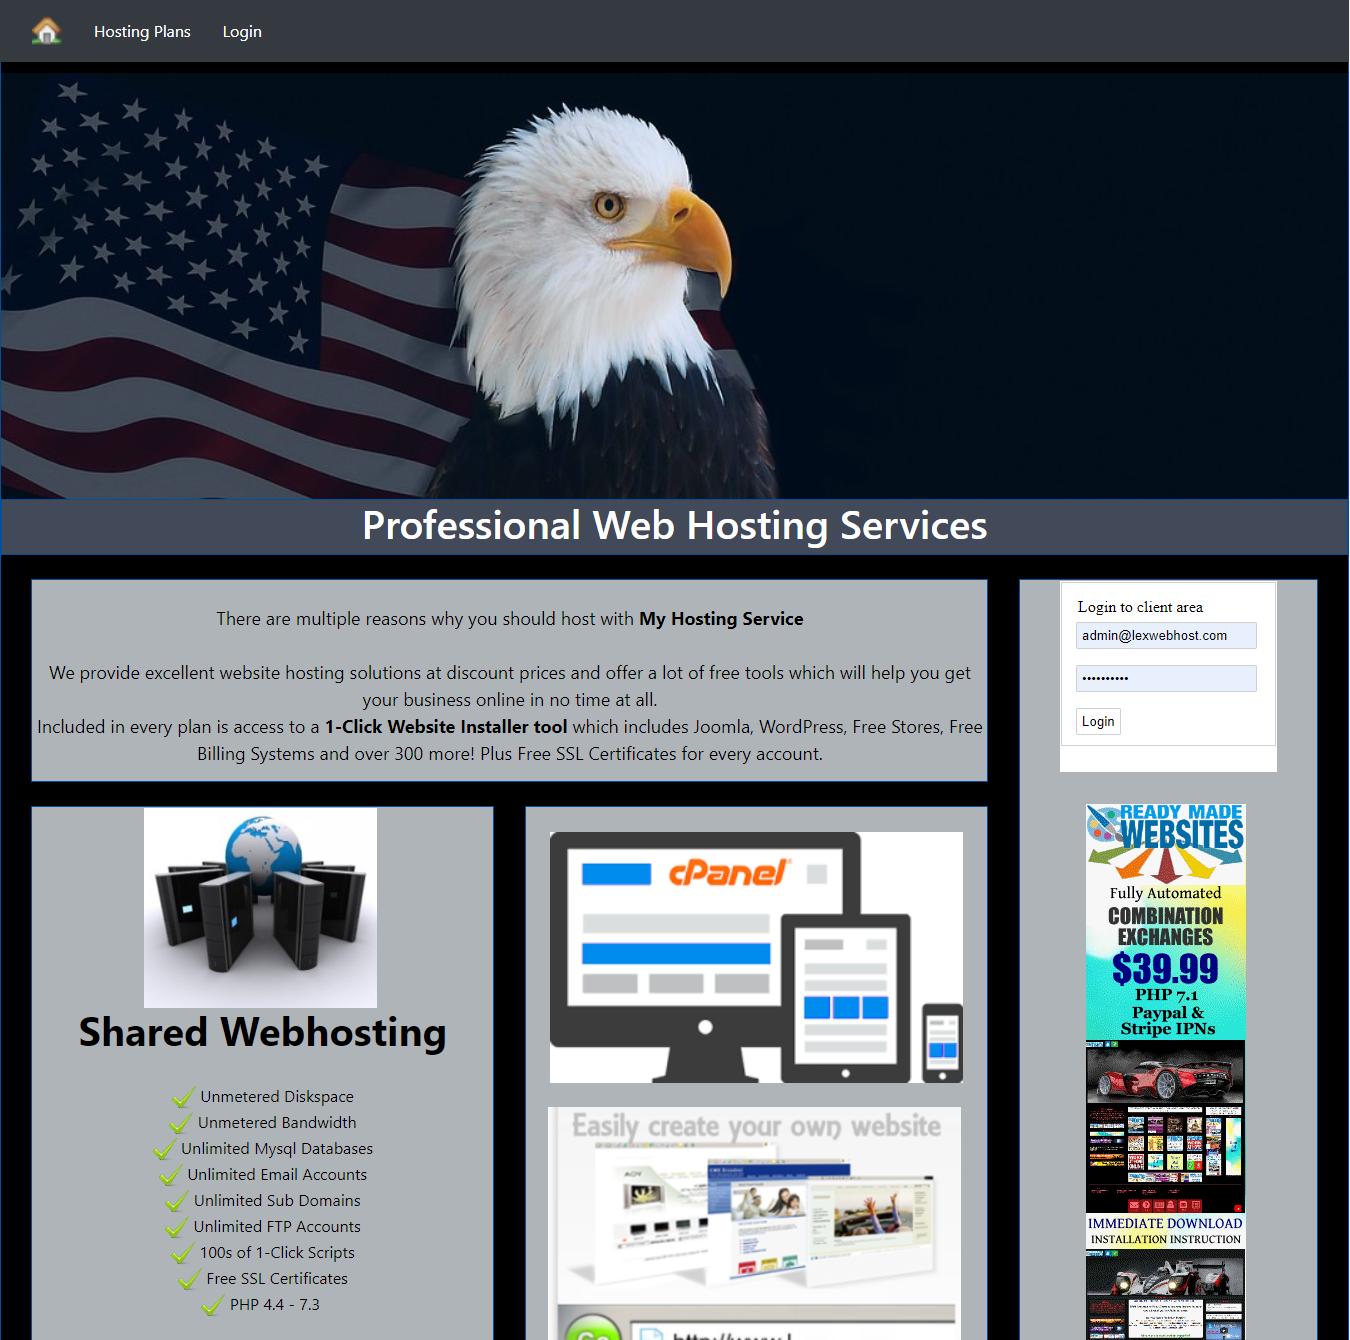 Buy a Turnkey Premium Reseller Hosting Billing Website that Makes Money Free SSL 1